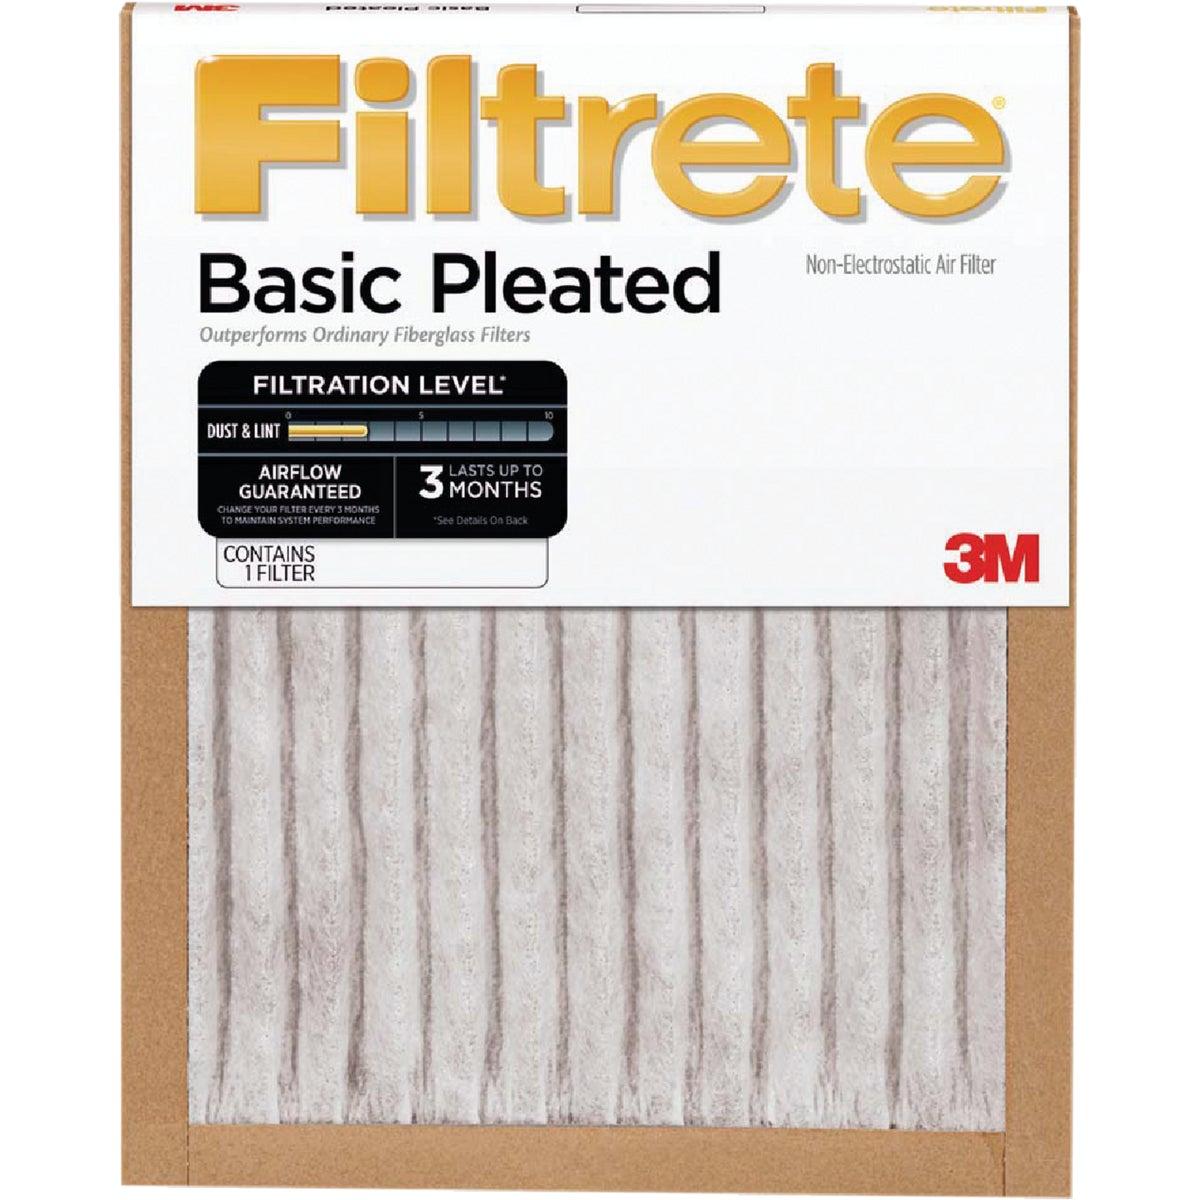 3M Filtrete 14 In. x 25 In. x 1 In. Basic Pleated 250 MPR Furnace Filter